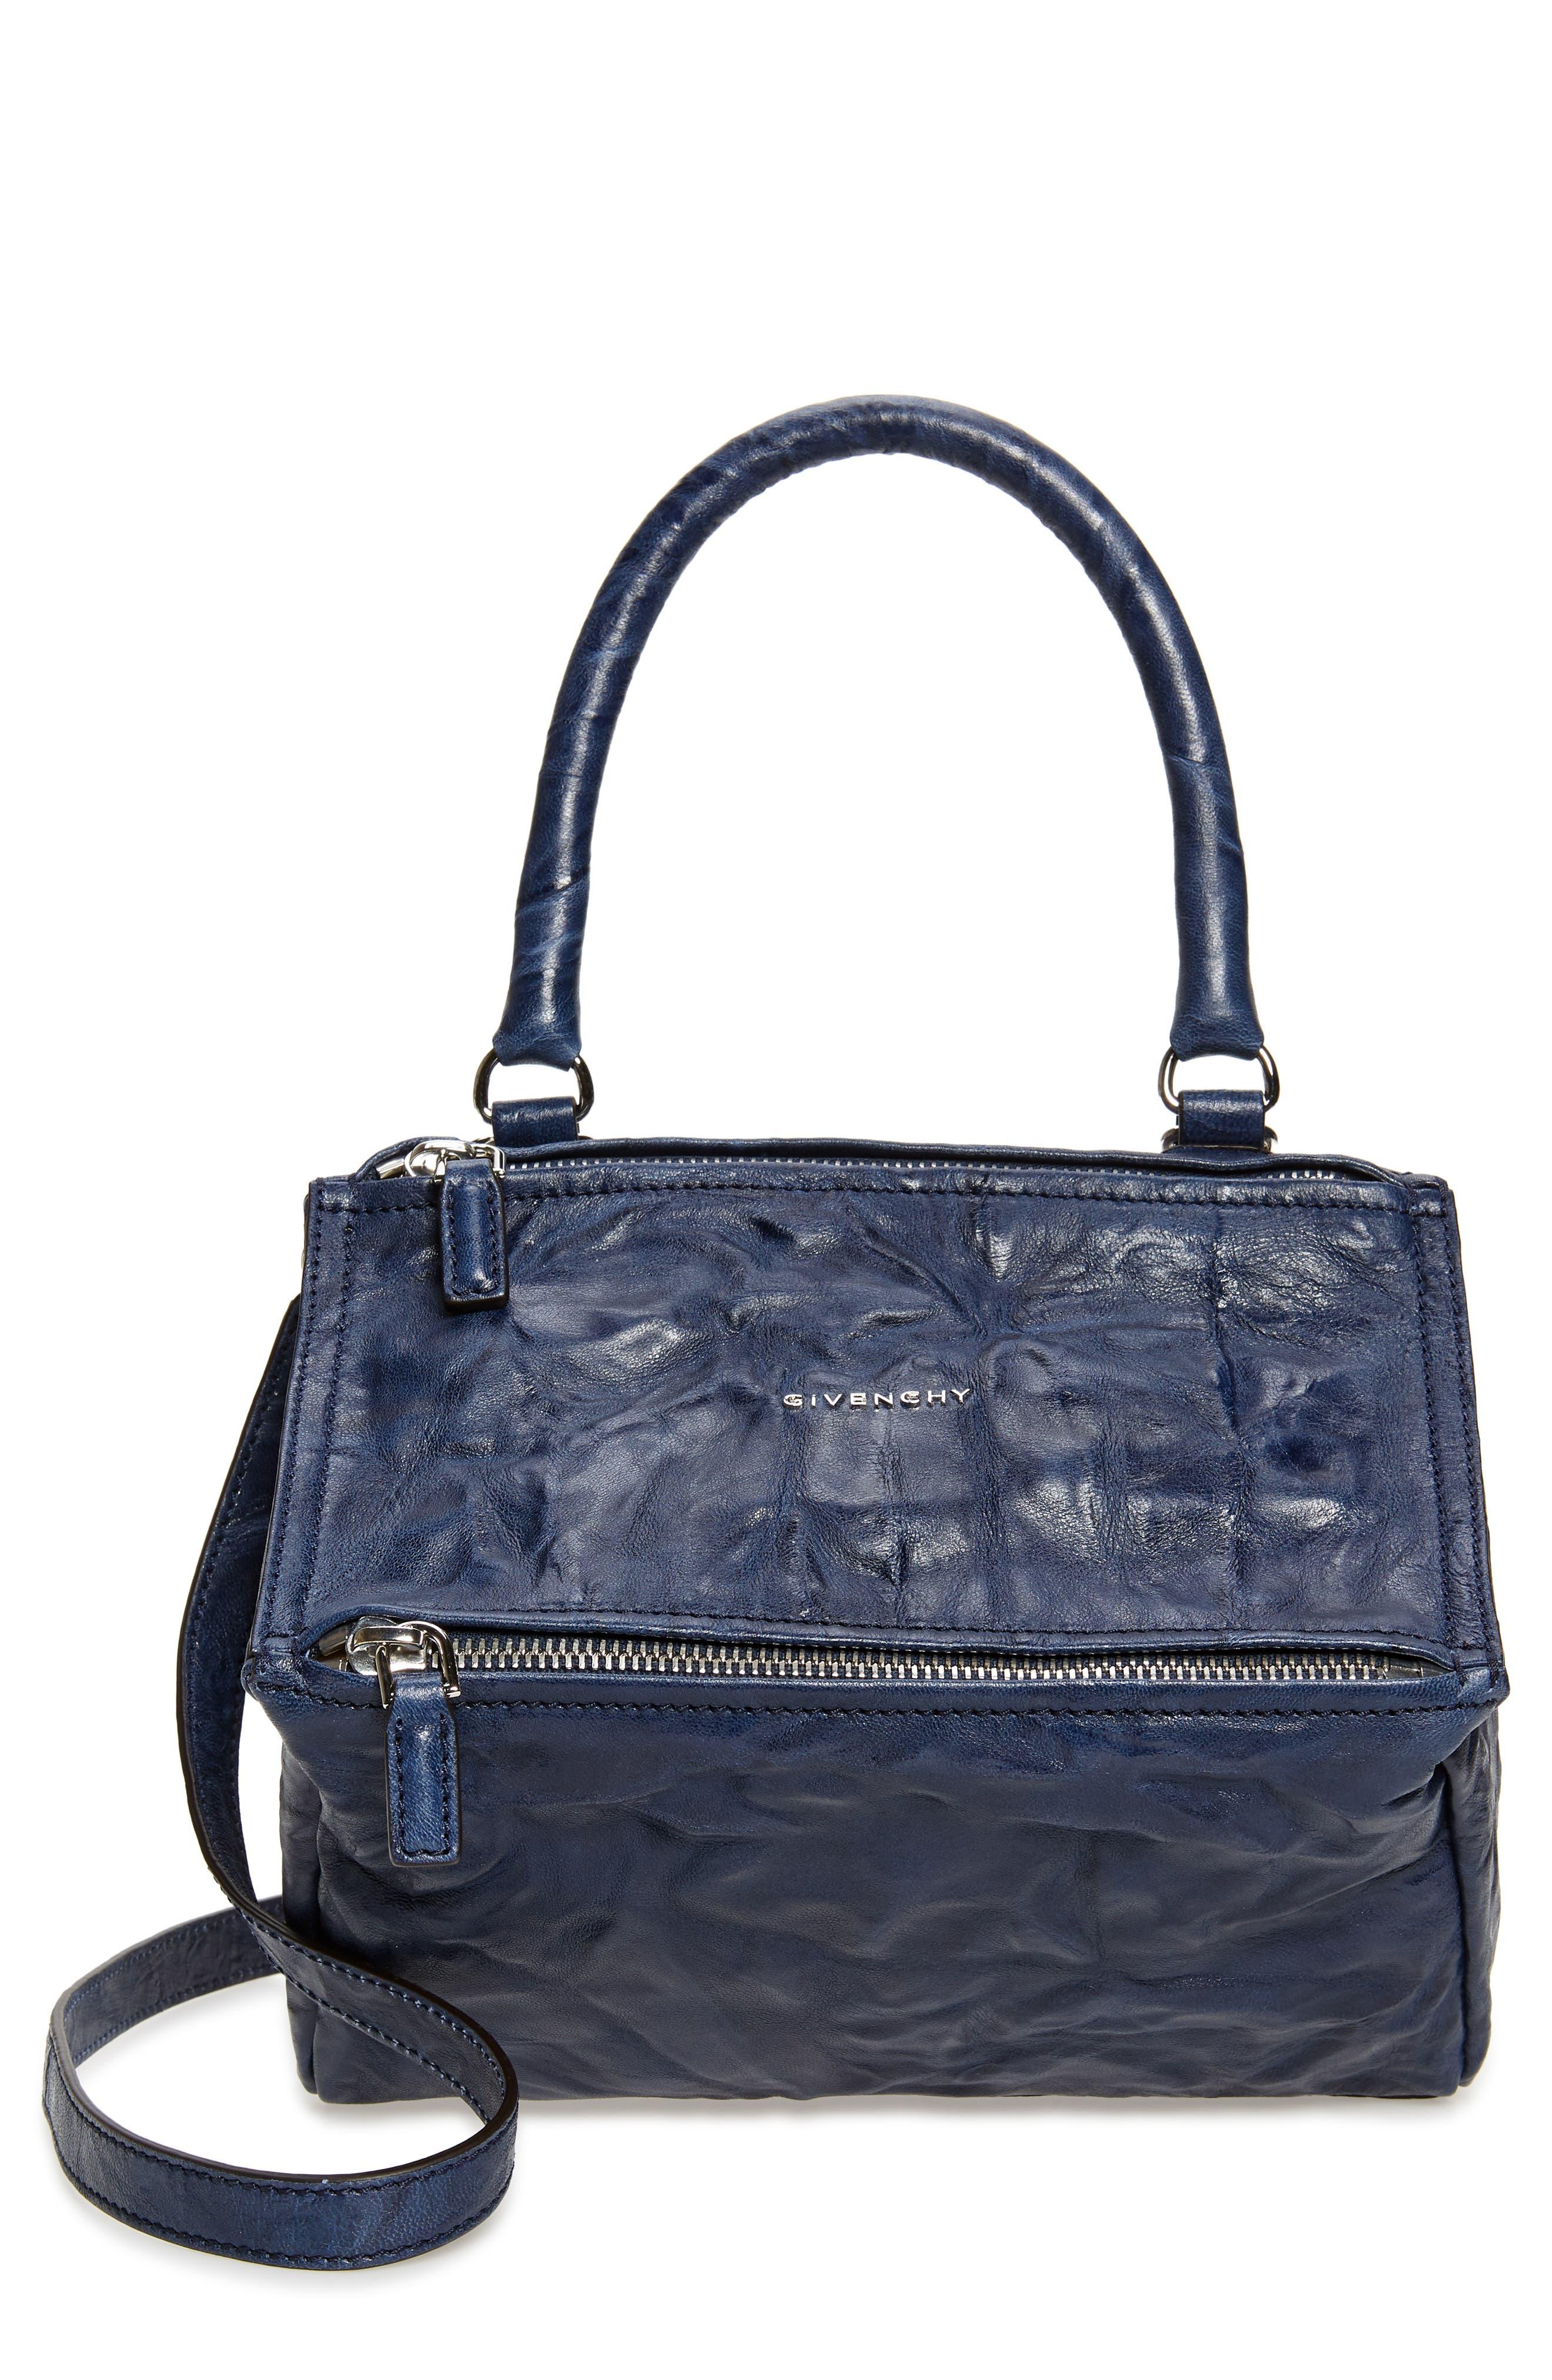 Givenchy Small Pepe Pandora Leather Shoulder Bag | Nordstrom